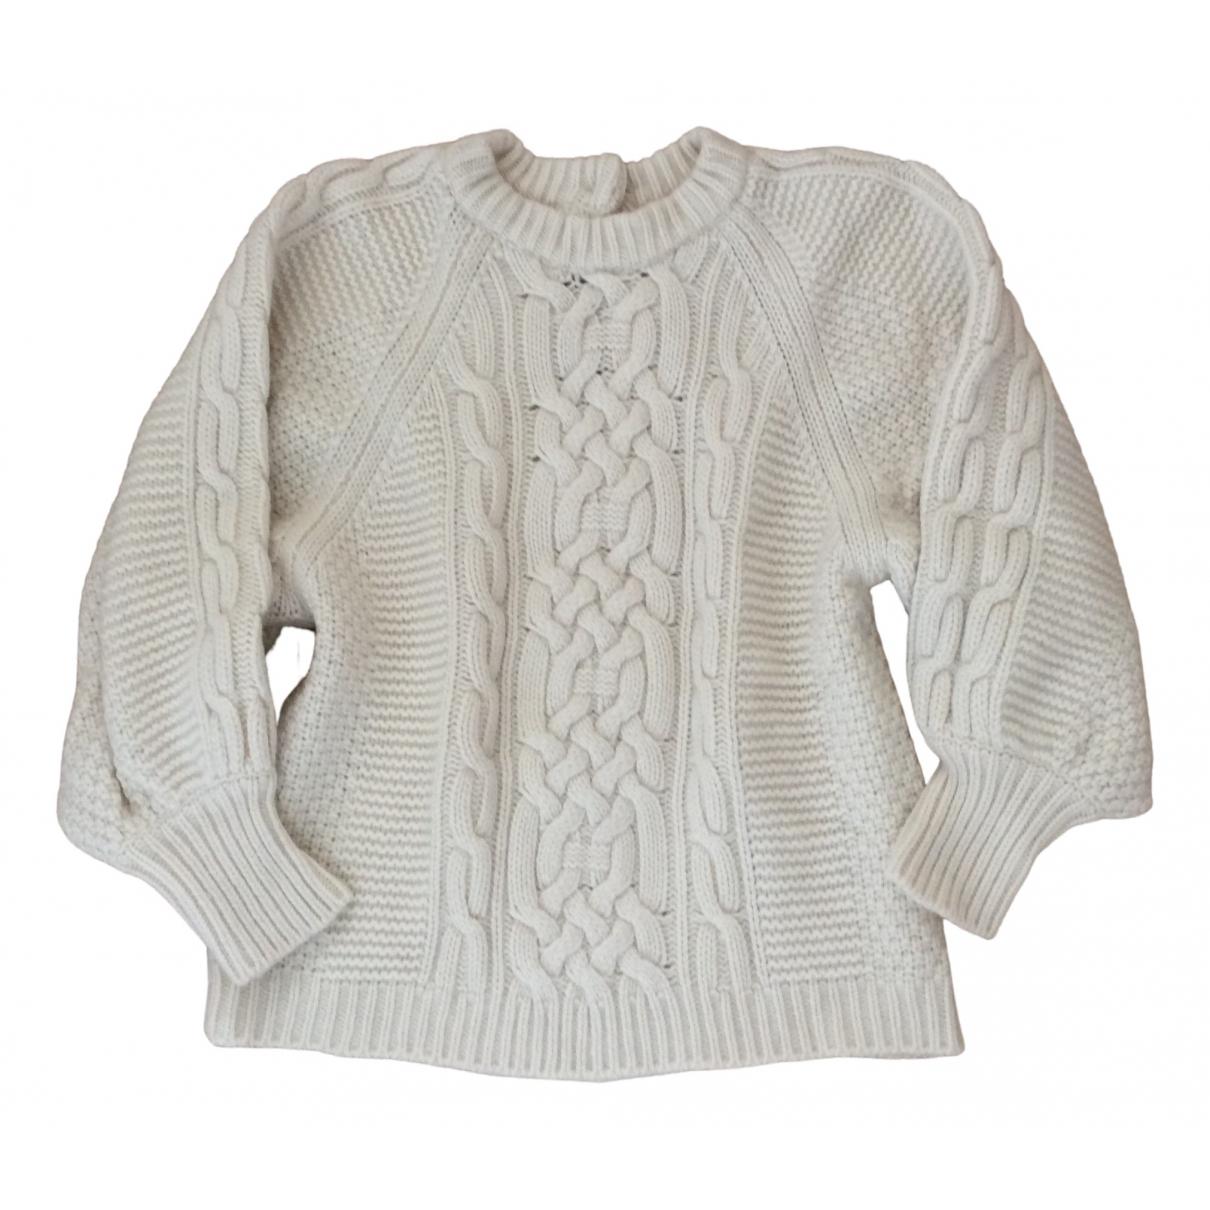 Ba&sh \N Pullover in  Ecru Wolle